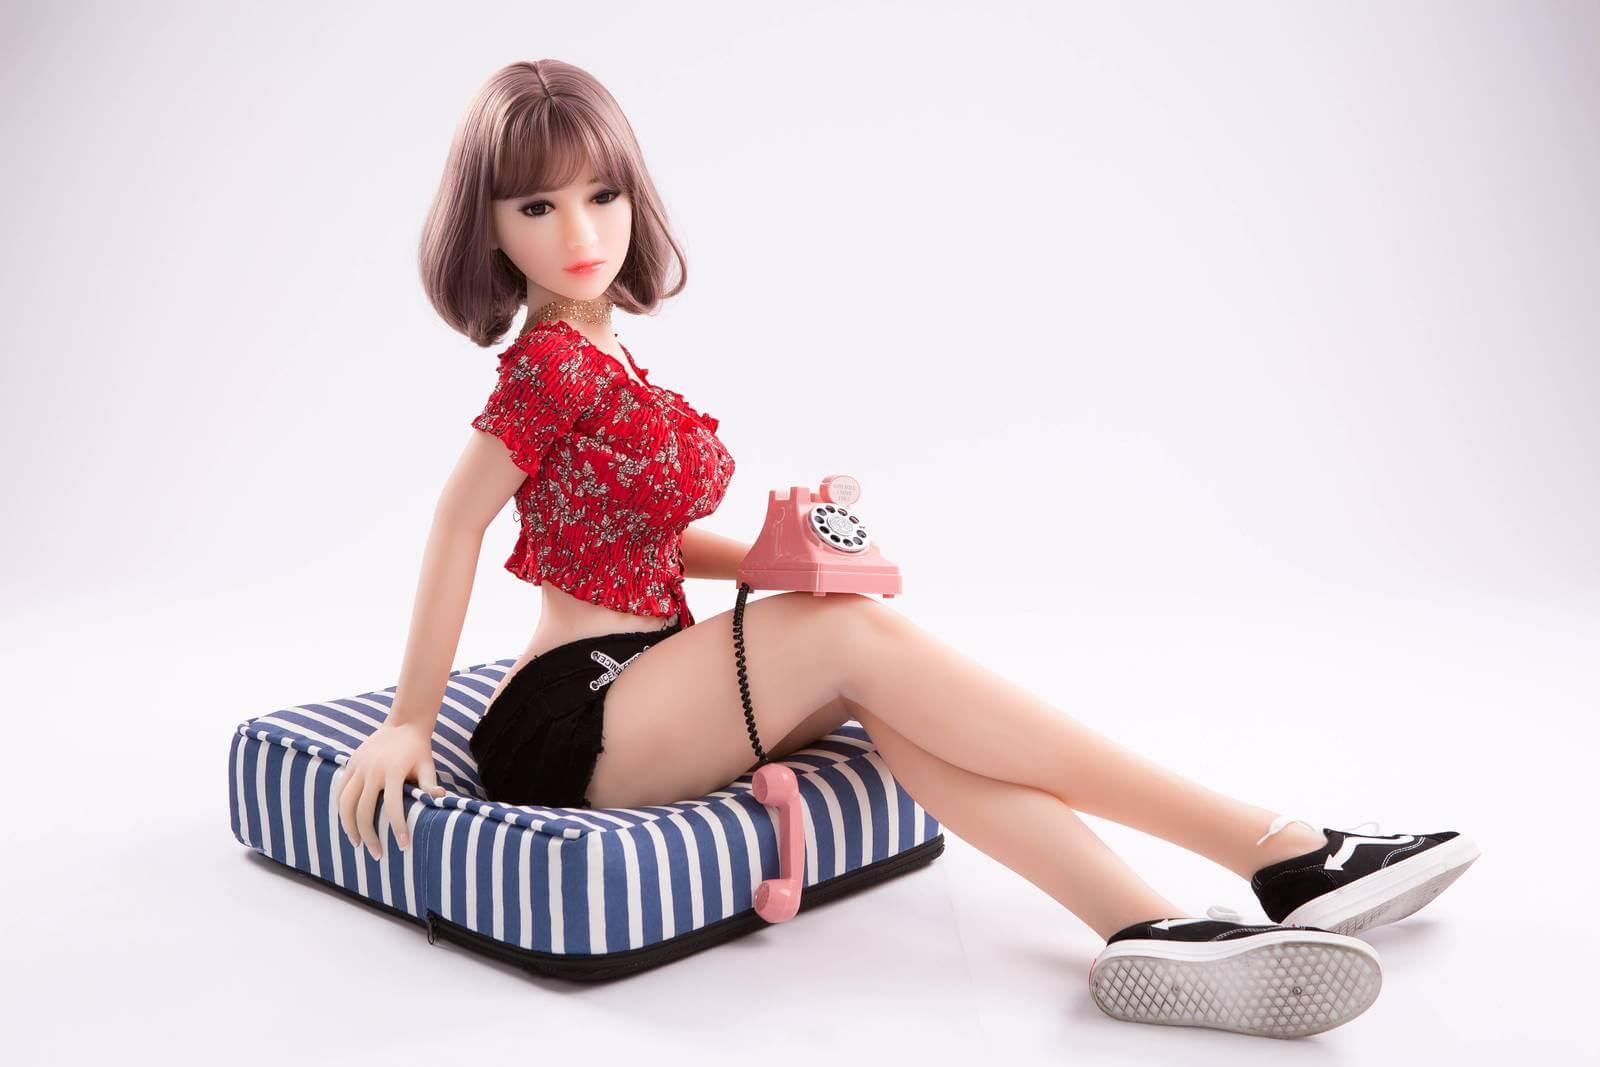 Realistic Teen Sex Doll